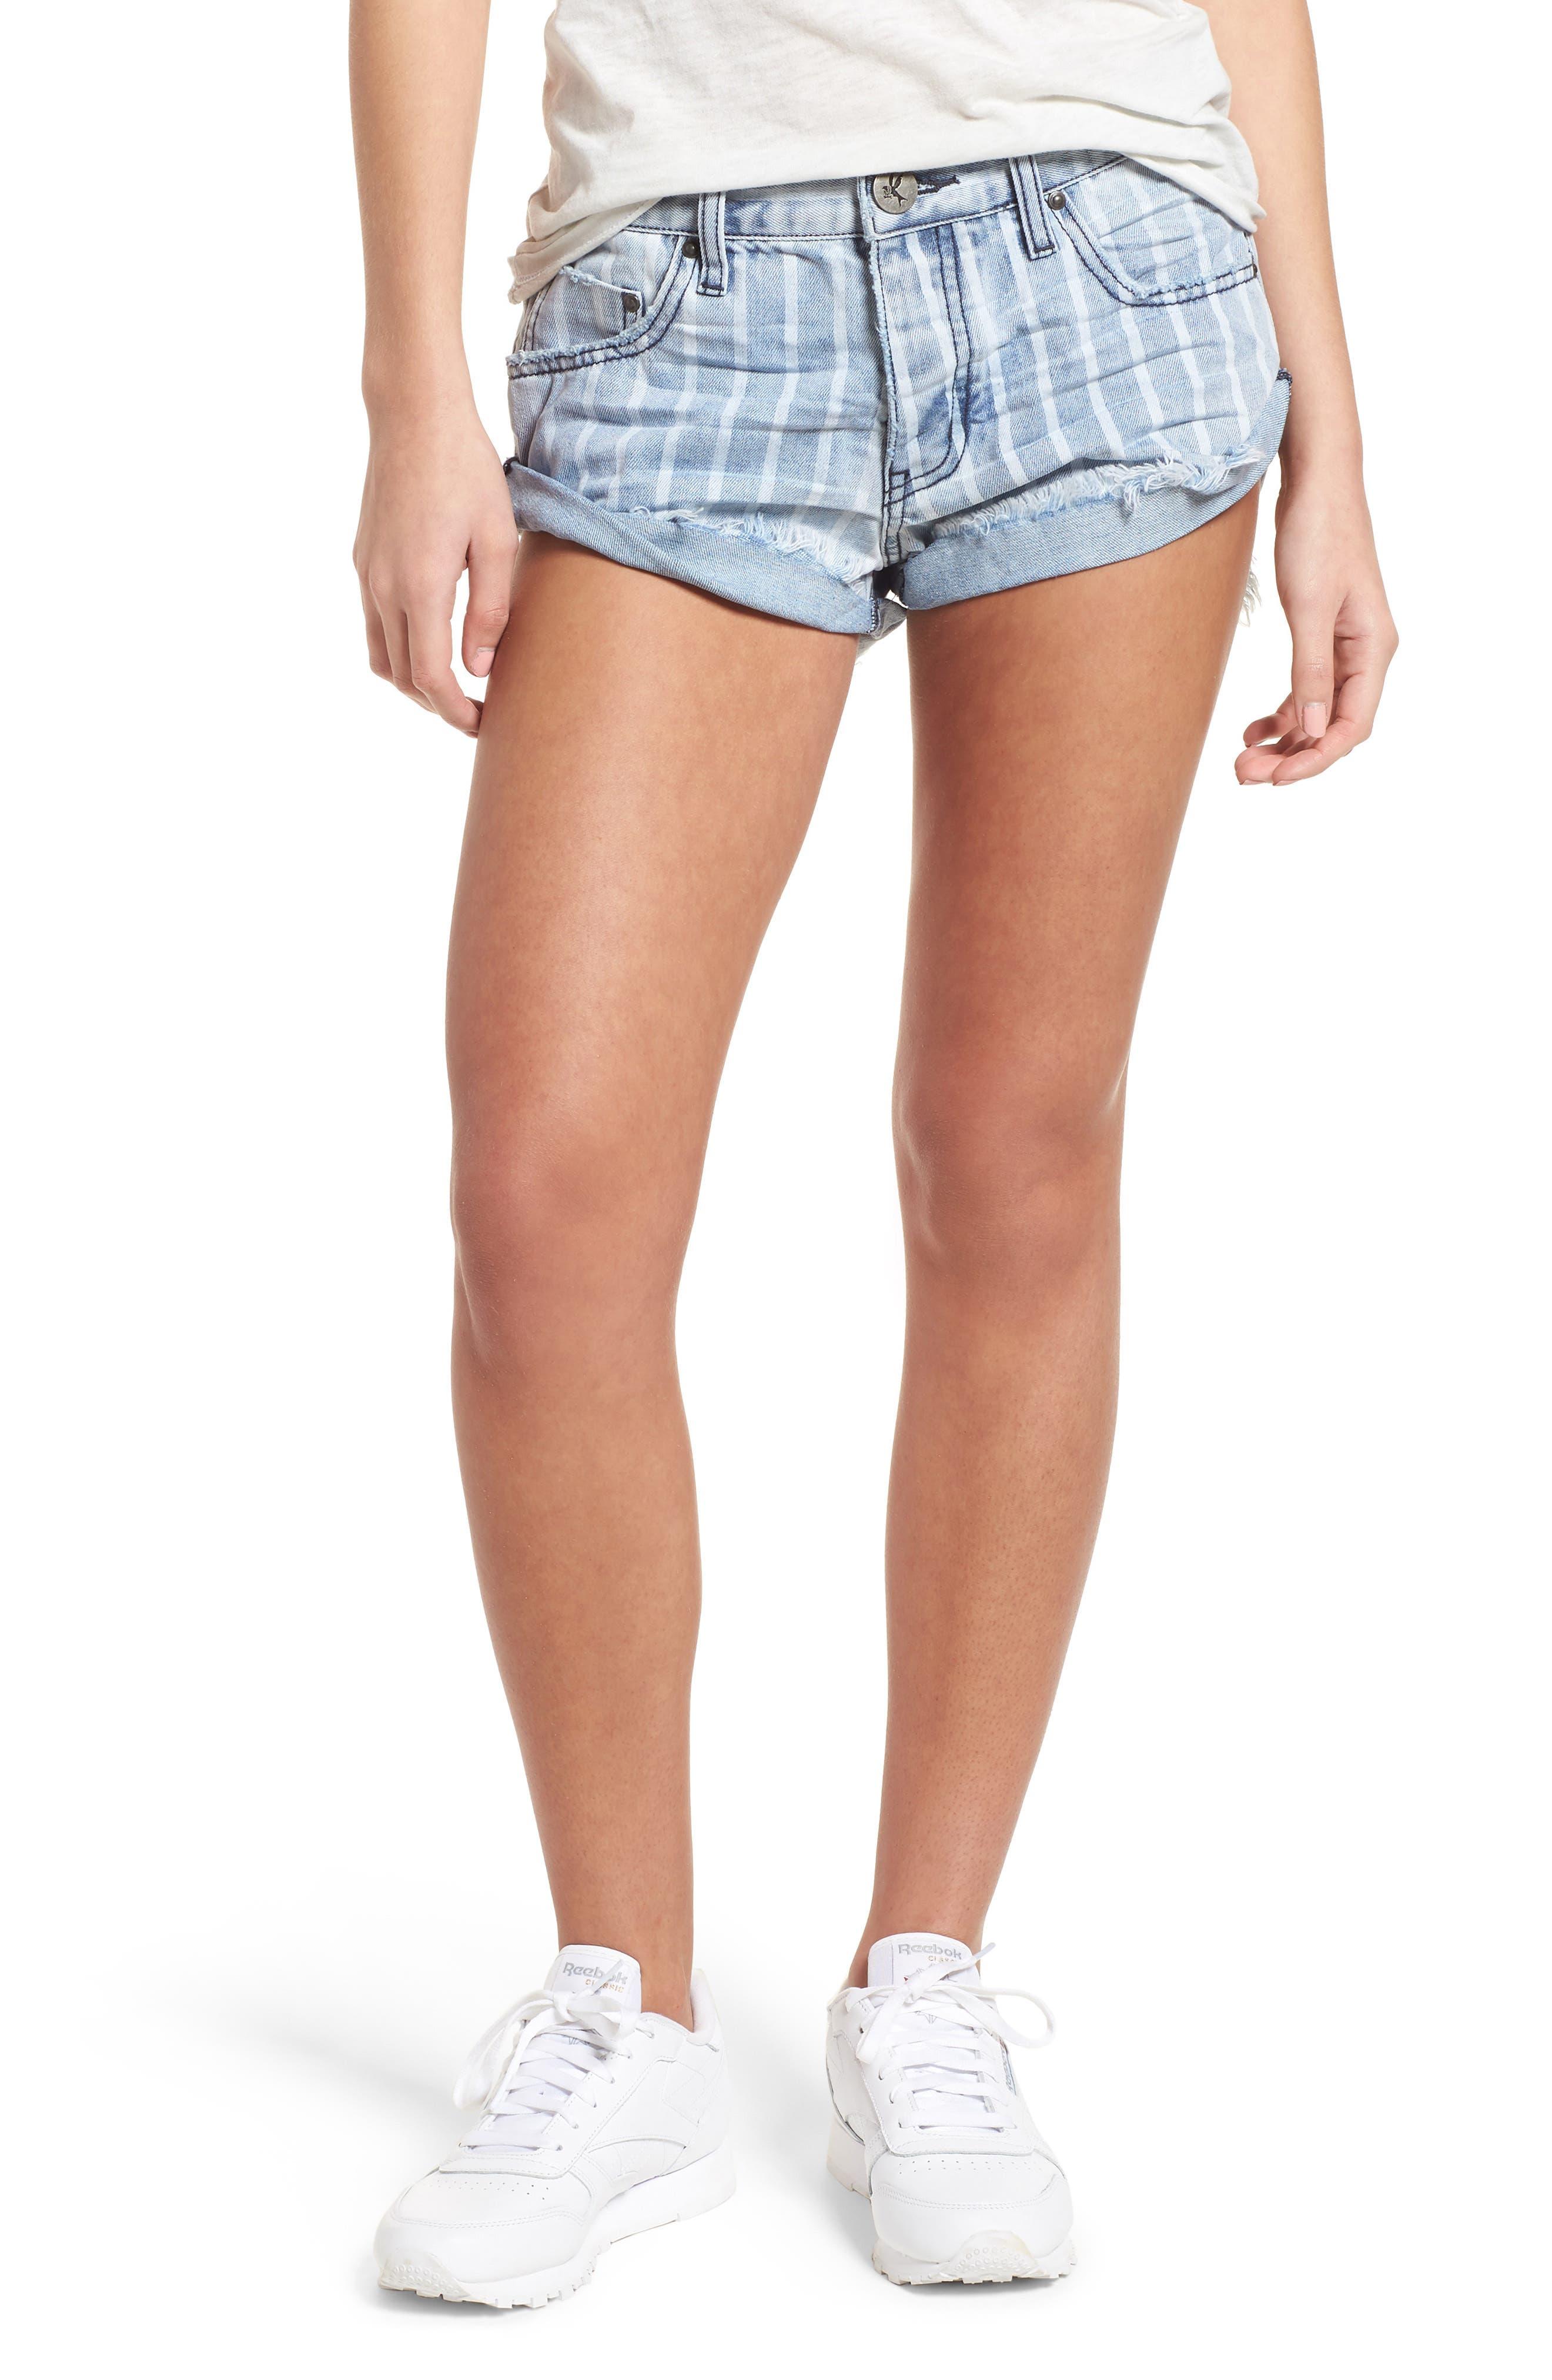 Bandit Stripe Denim Shorts,                         Main,                         color, 400